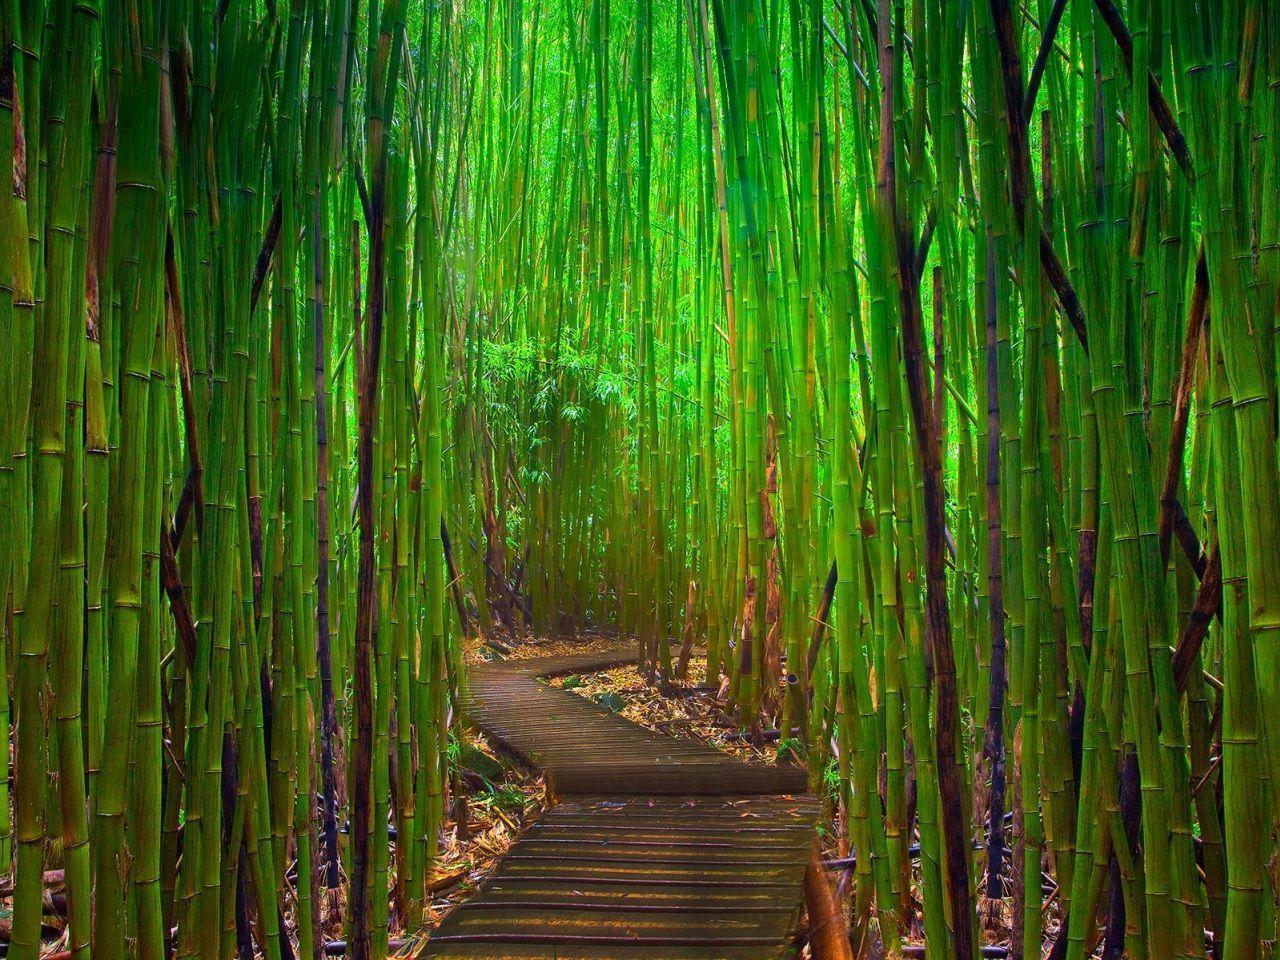 Green Bamboo Wallpapers Wallpaper Cave